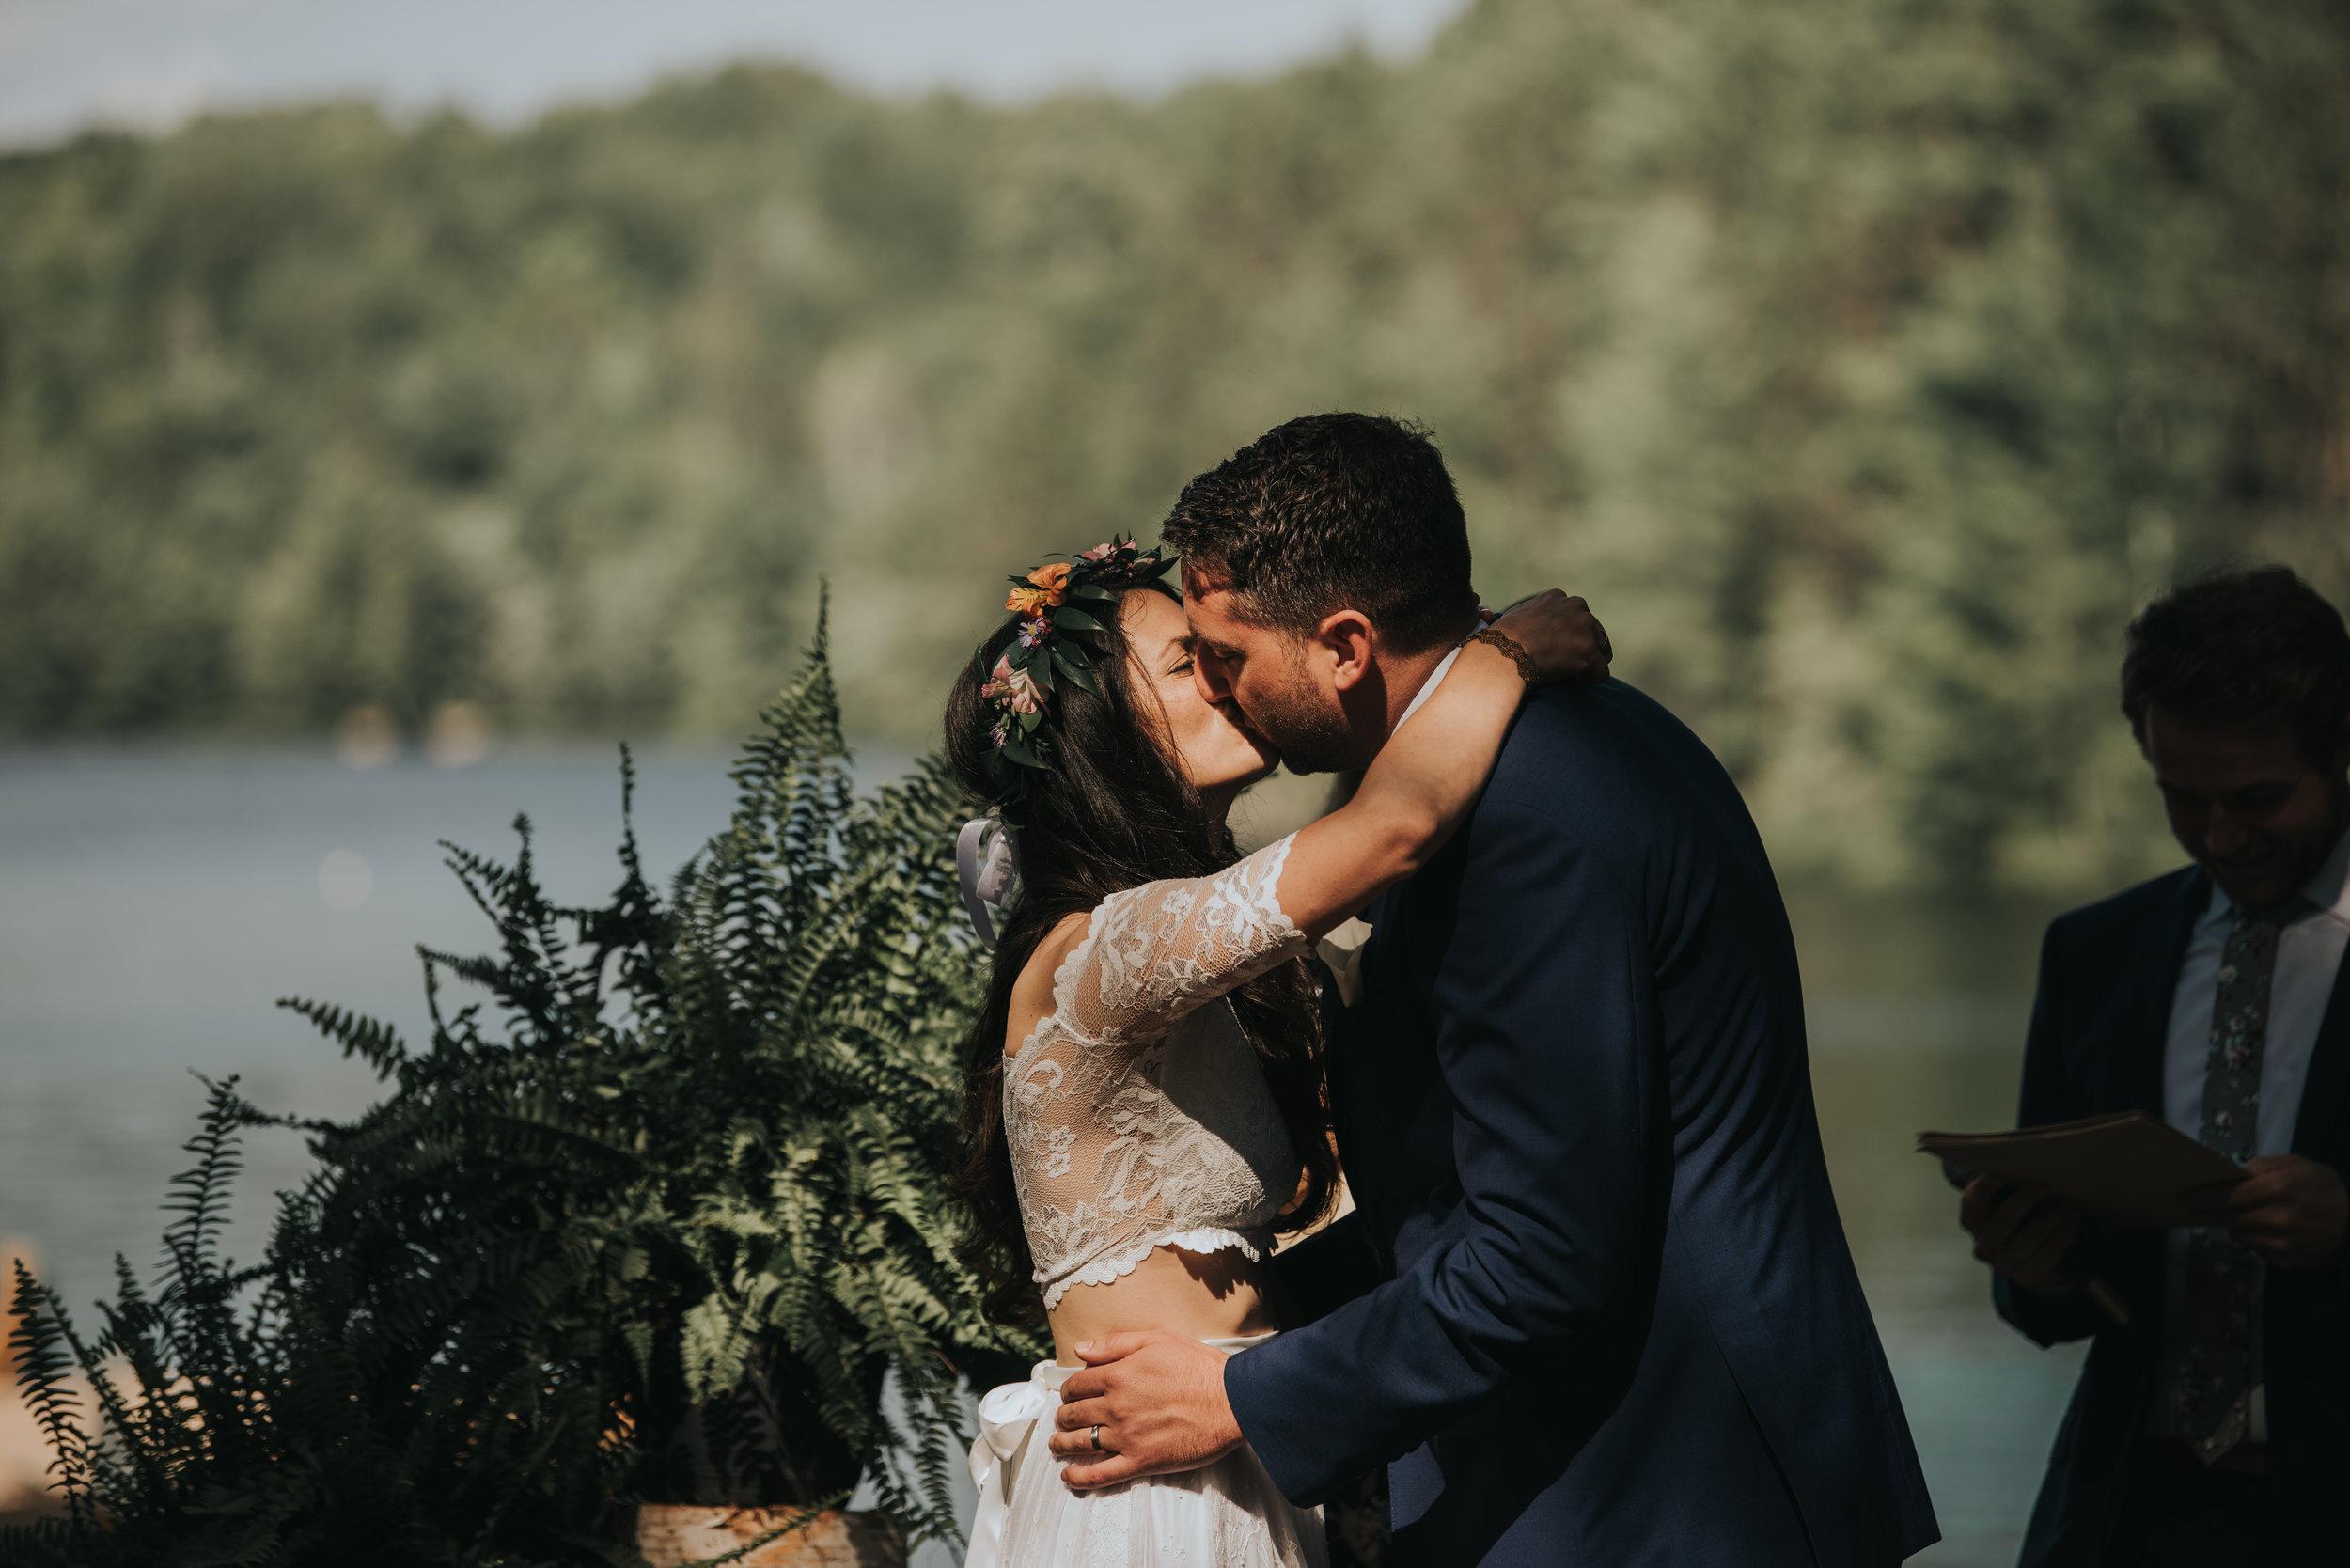 bride-and-groom-first-kiss-toronto-bohemian-boho-outdoor-summer-wedding-documentary-wedding-photography-by-willow-birch-photo.jpg